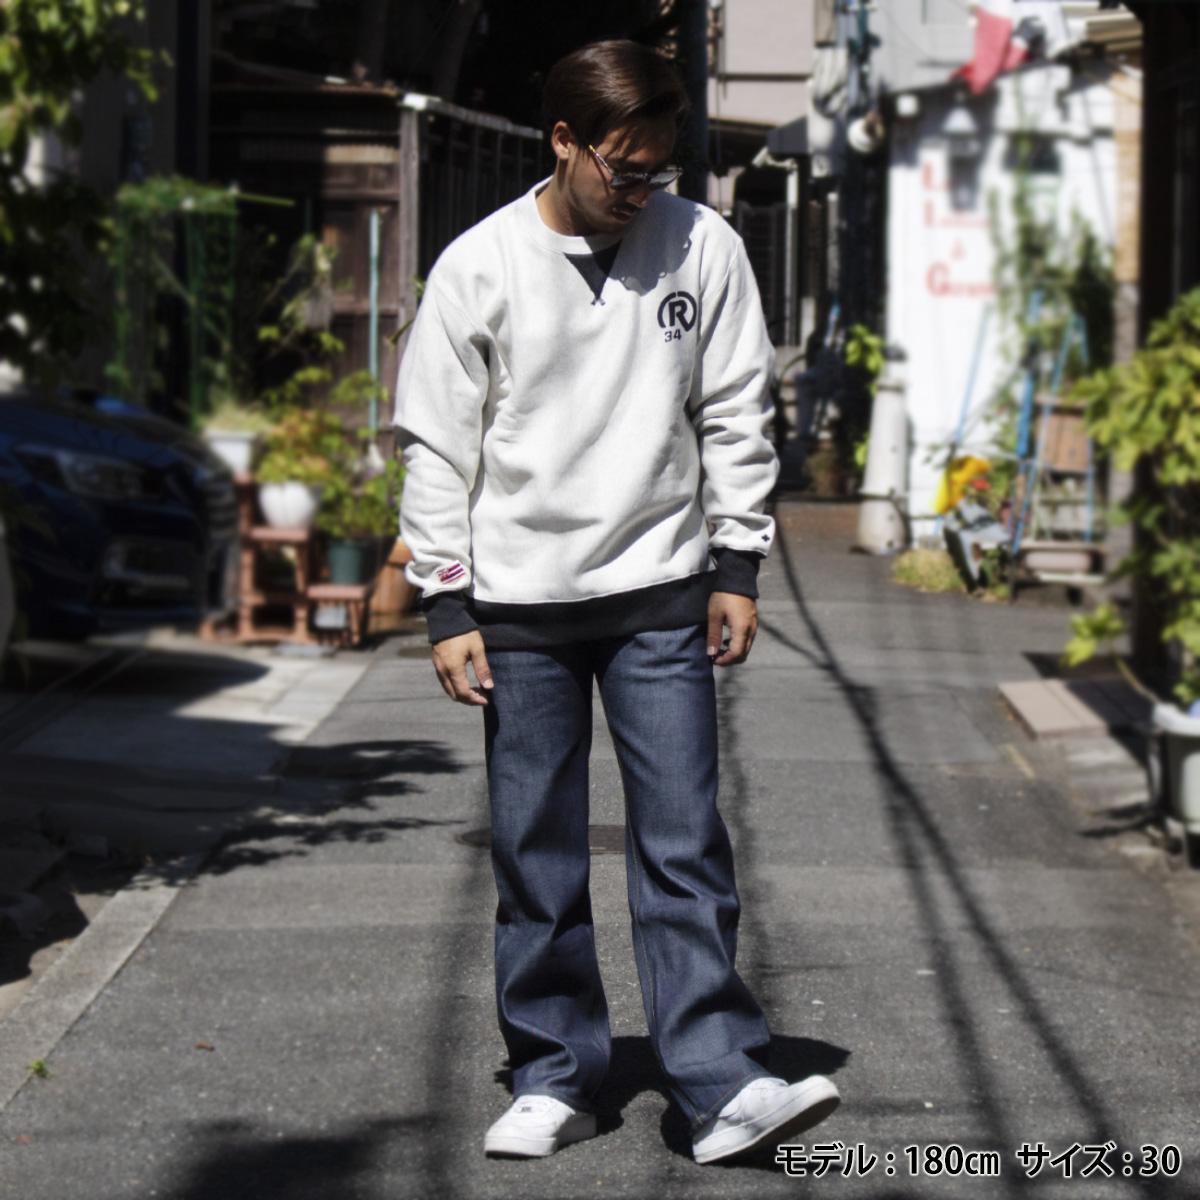 R MARK MADE IN JAPAN DENIM